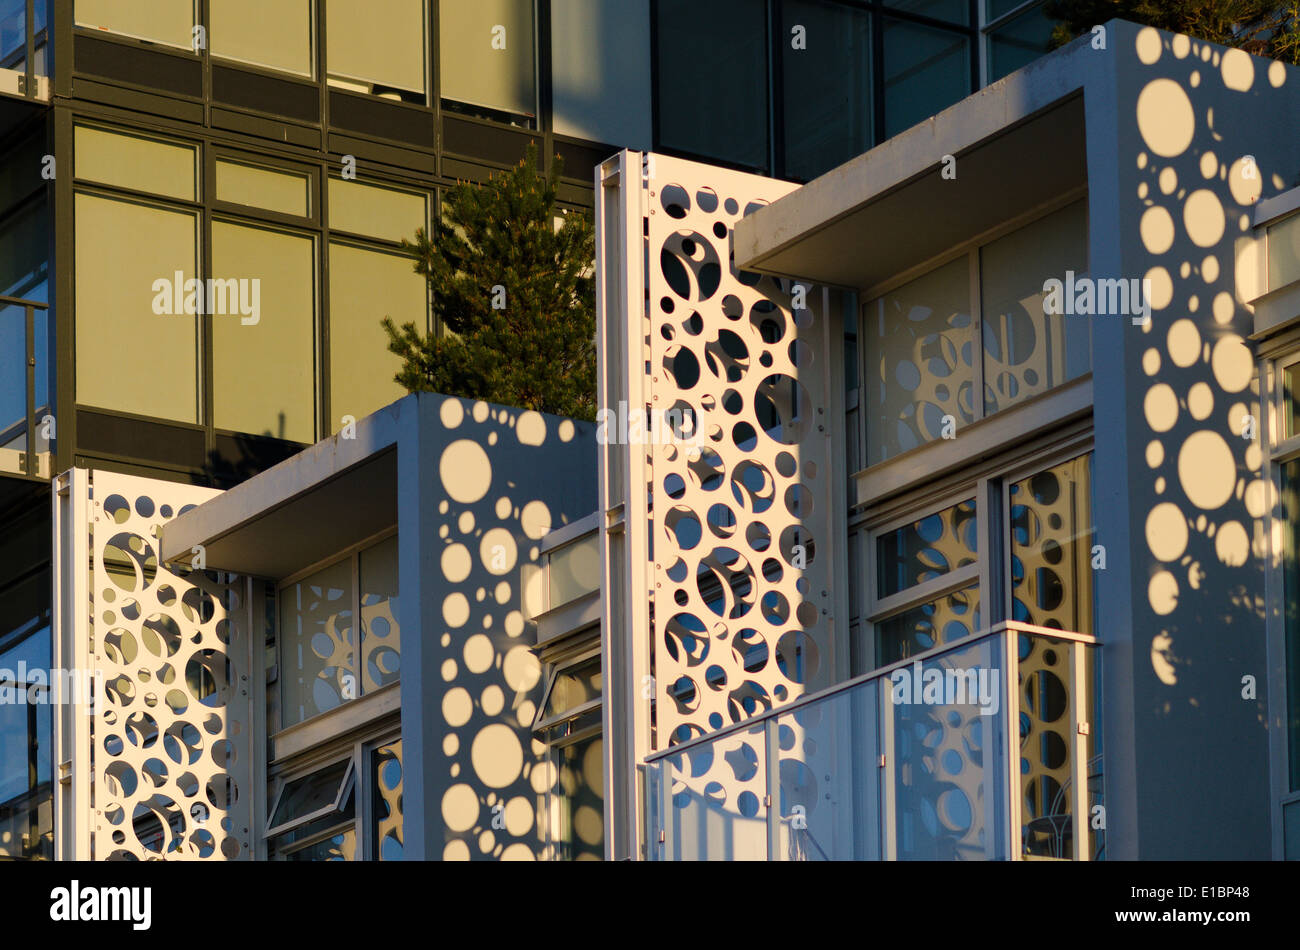 Condo apartments using circle holes as part of design - Stock Image